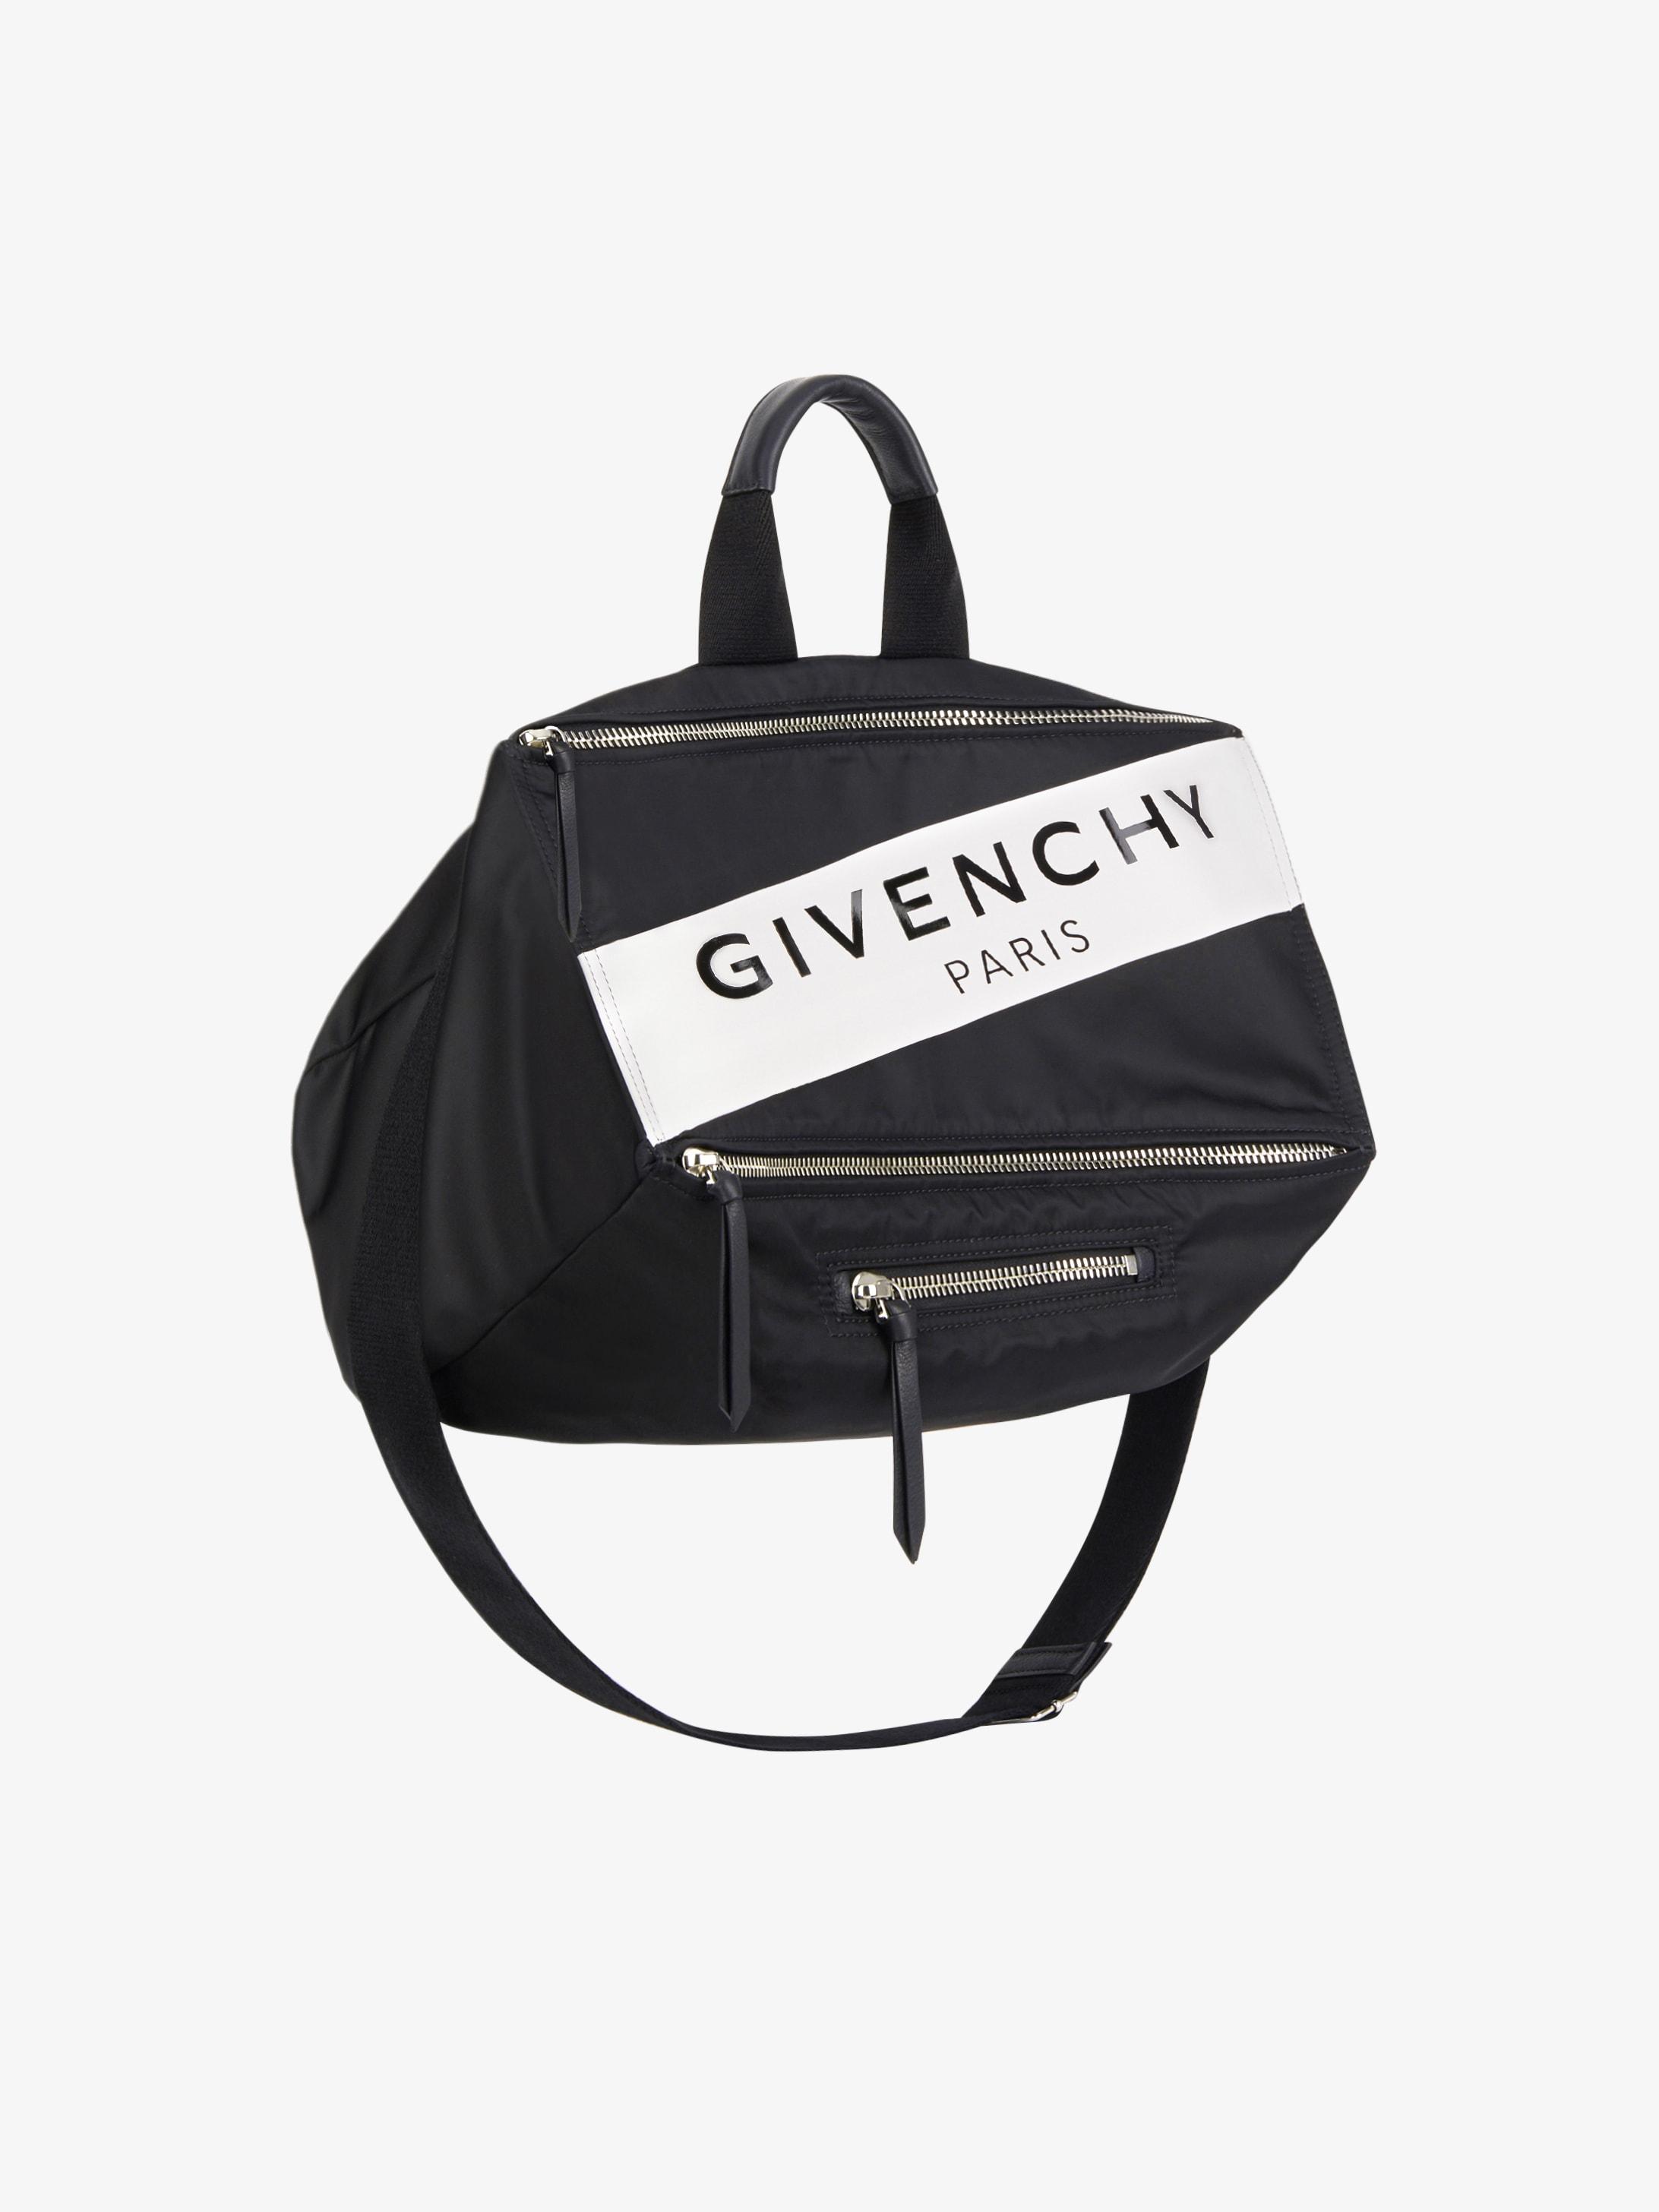 GIVENCHY PARIS Pandora messenger bag in nylon